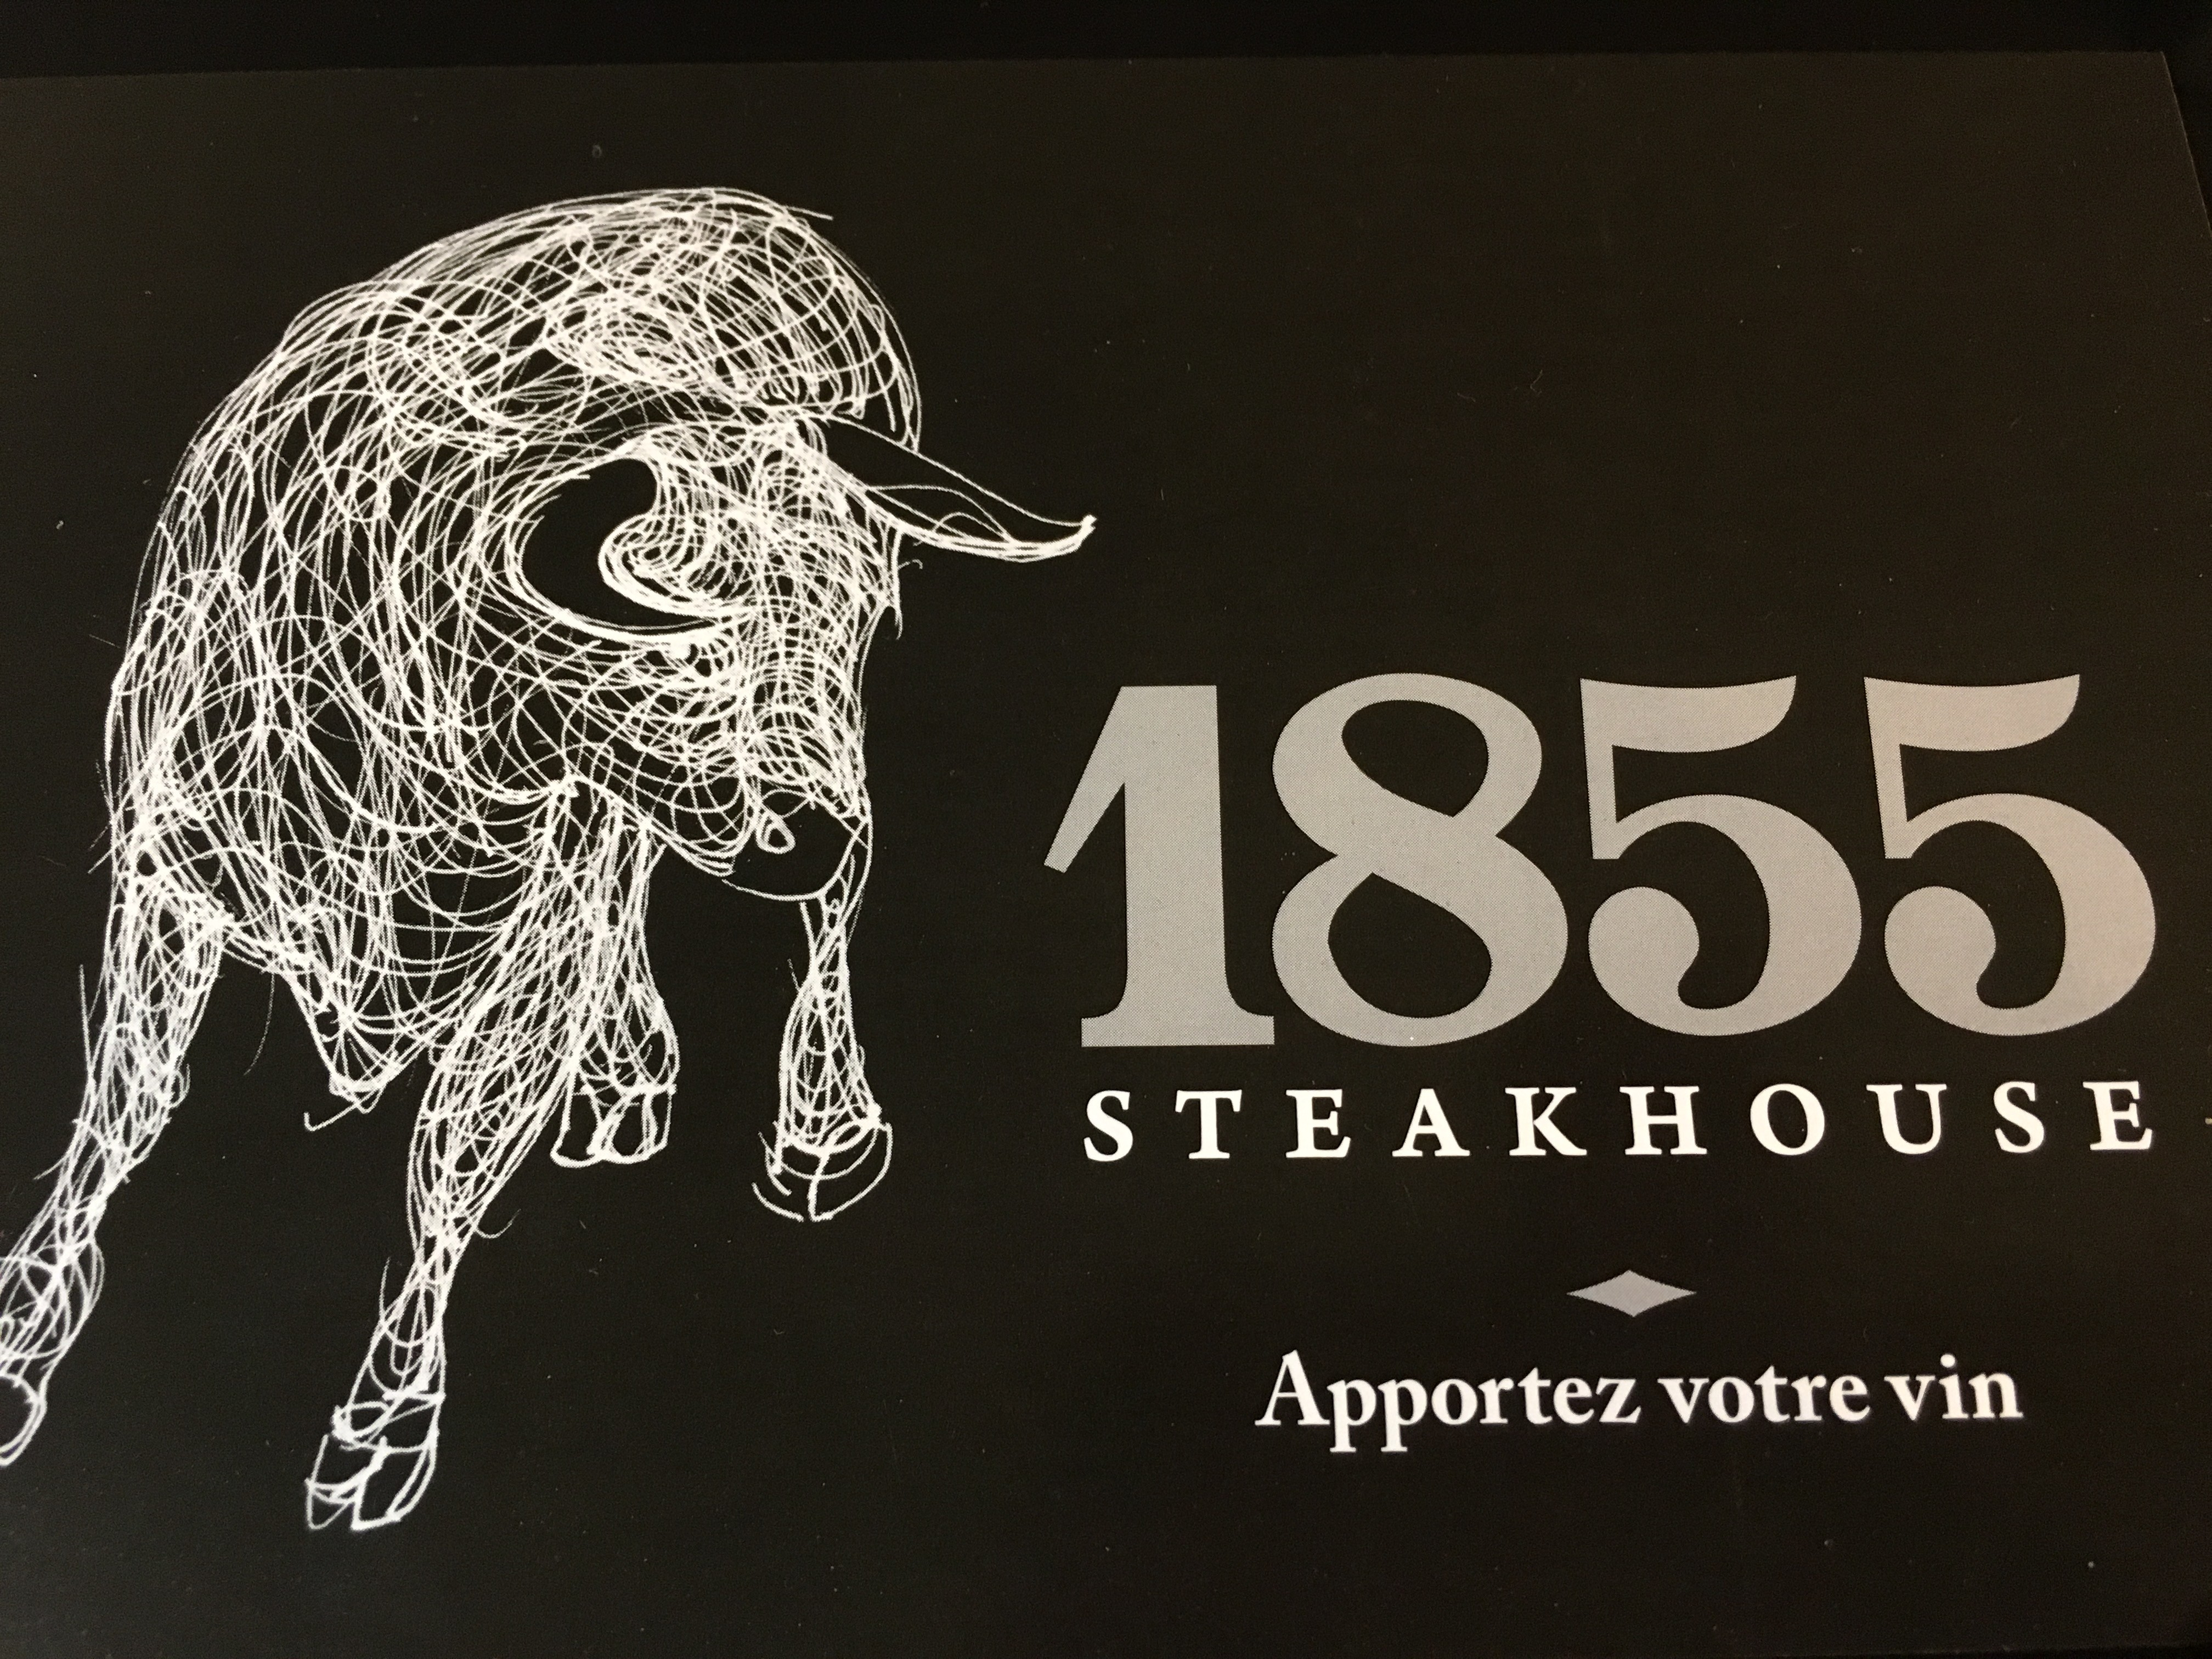 Le 1855 steakhouse logo Serveur / Serveuse resto emploi restaurant